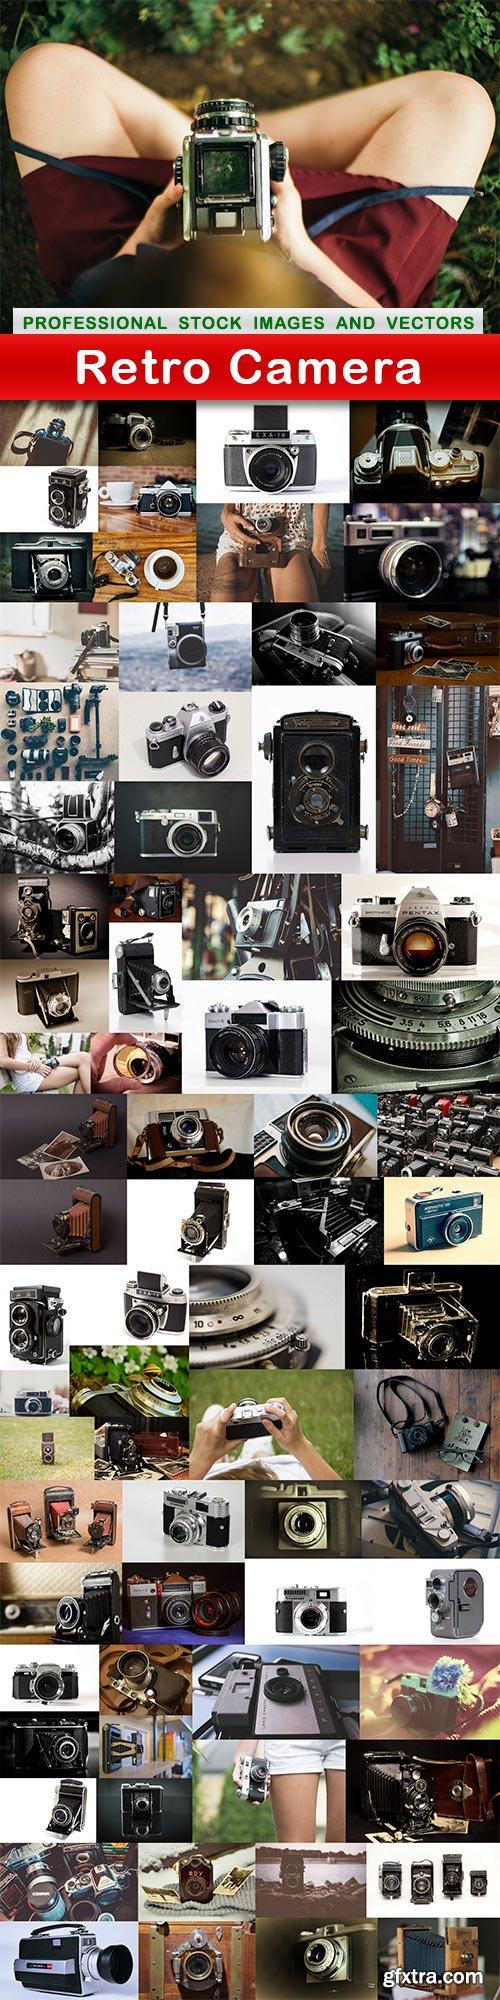 Retro Camera - 75 UHQ JPEG